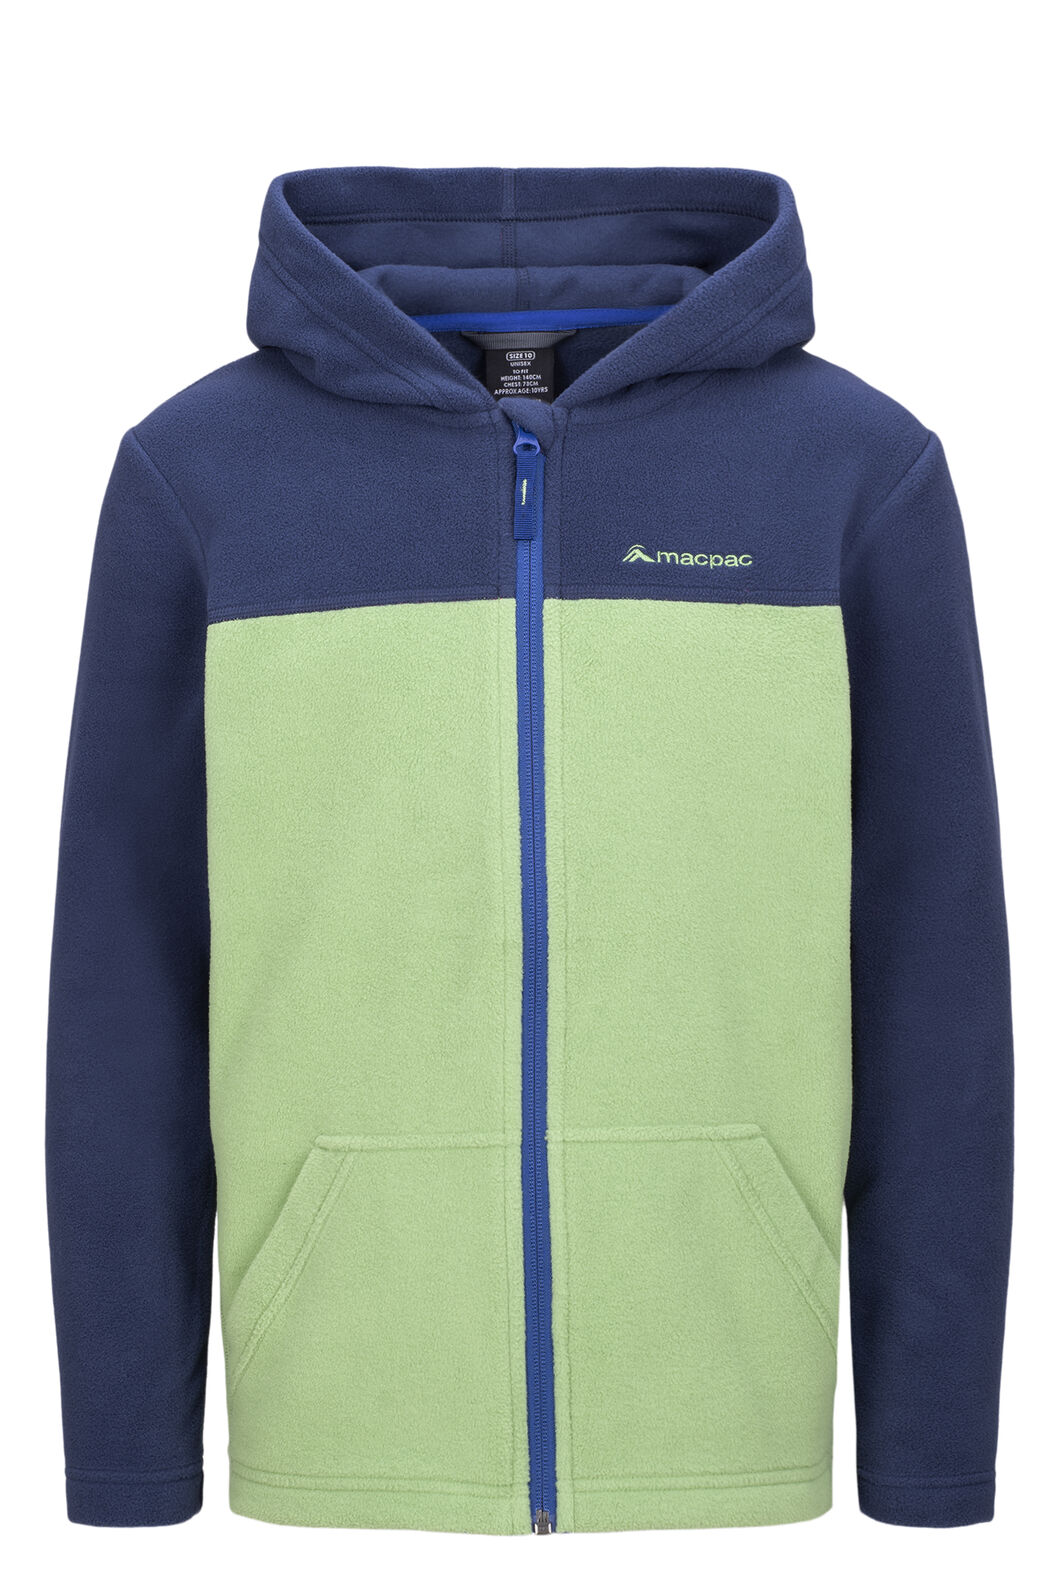 Macpac Tui Polartec® Fleece Jacket — Kids', Black Iris/Jade Green, hi-res